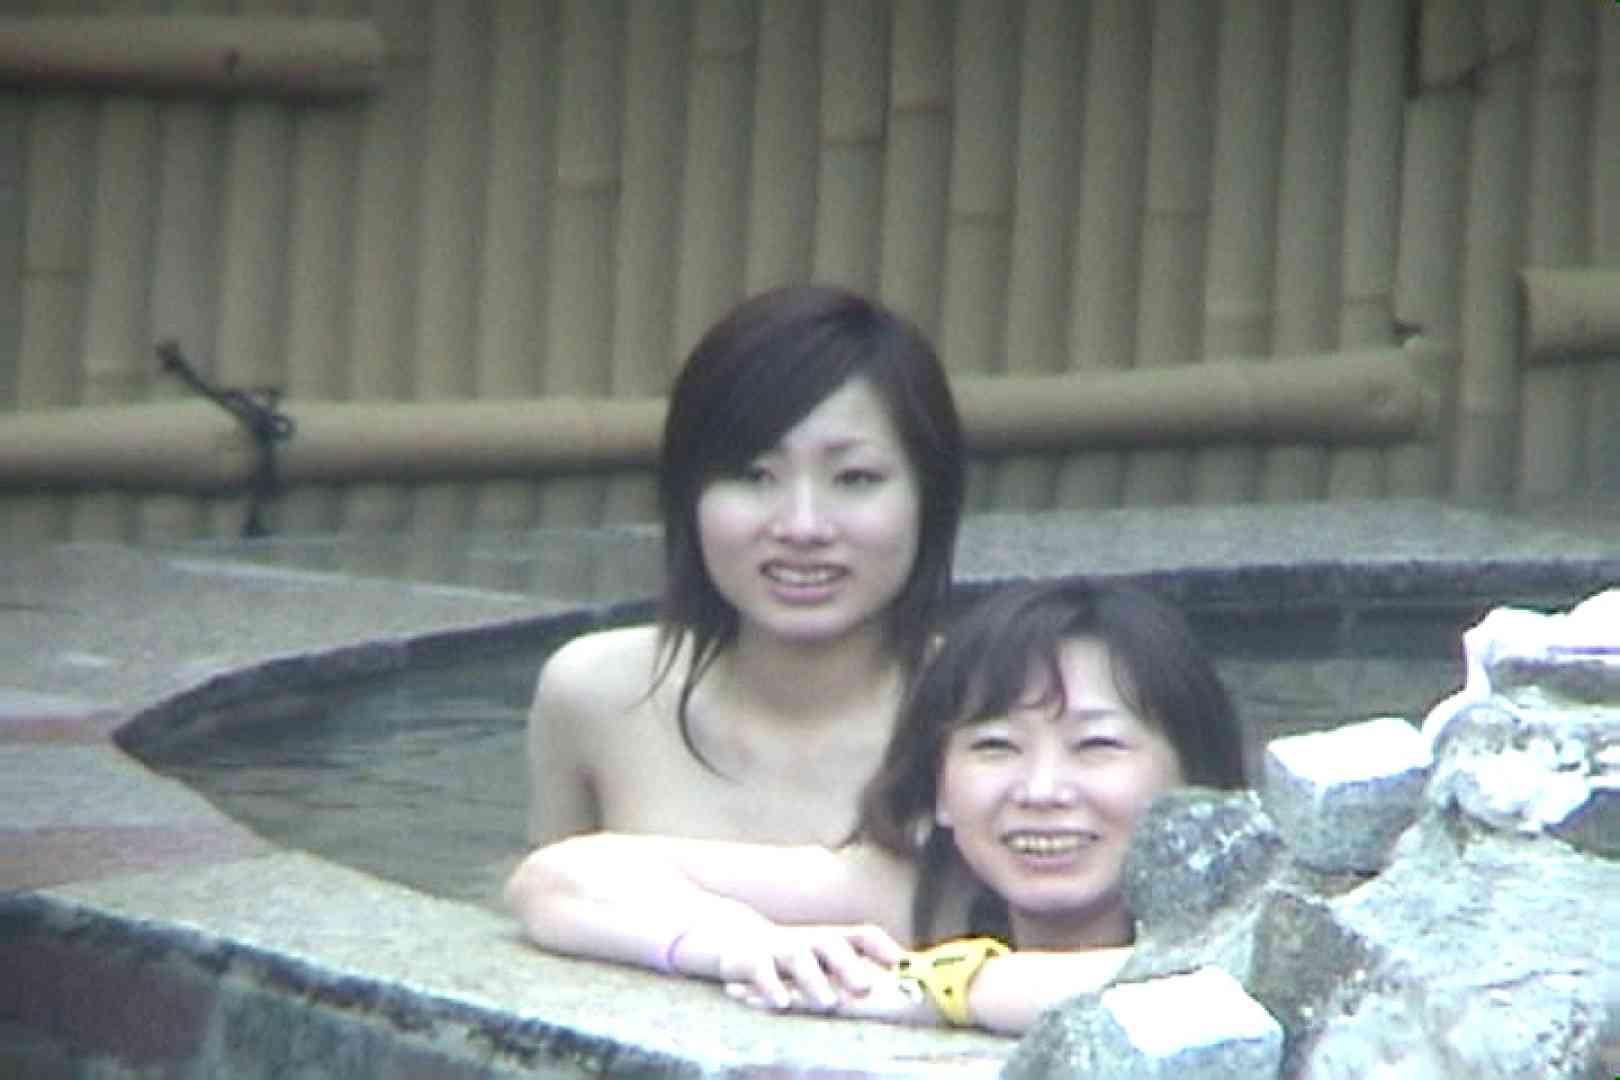 Aquaな露天風呂Vol.58【VIP限定】 露天風呂突入 盗撮動画紹介 97pic 35